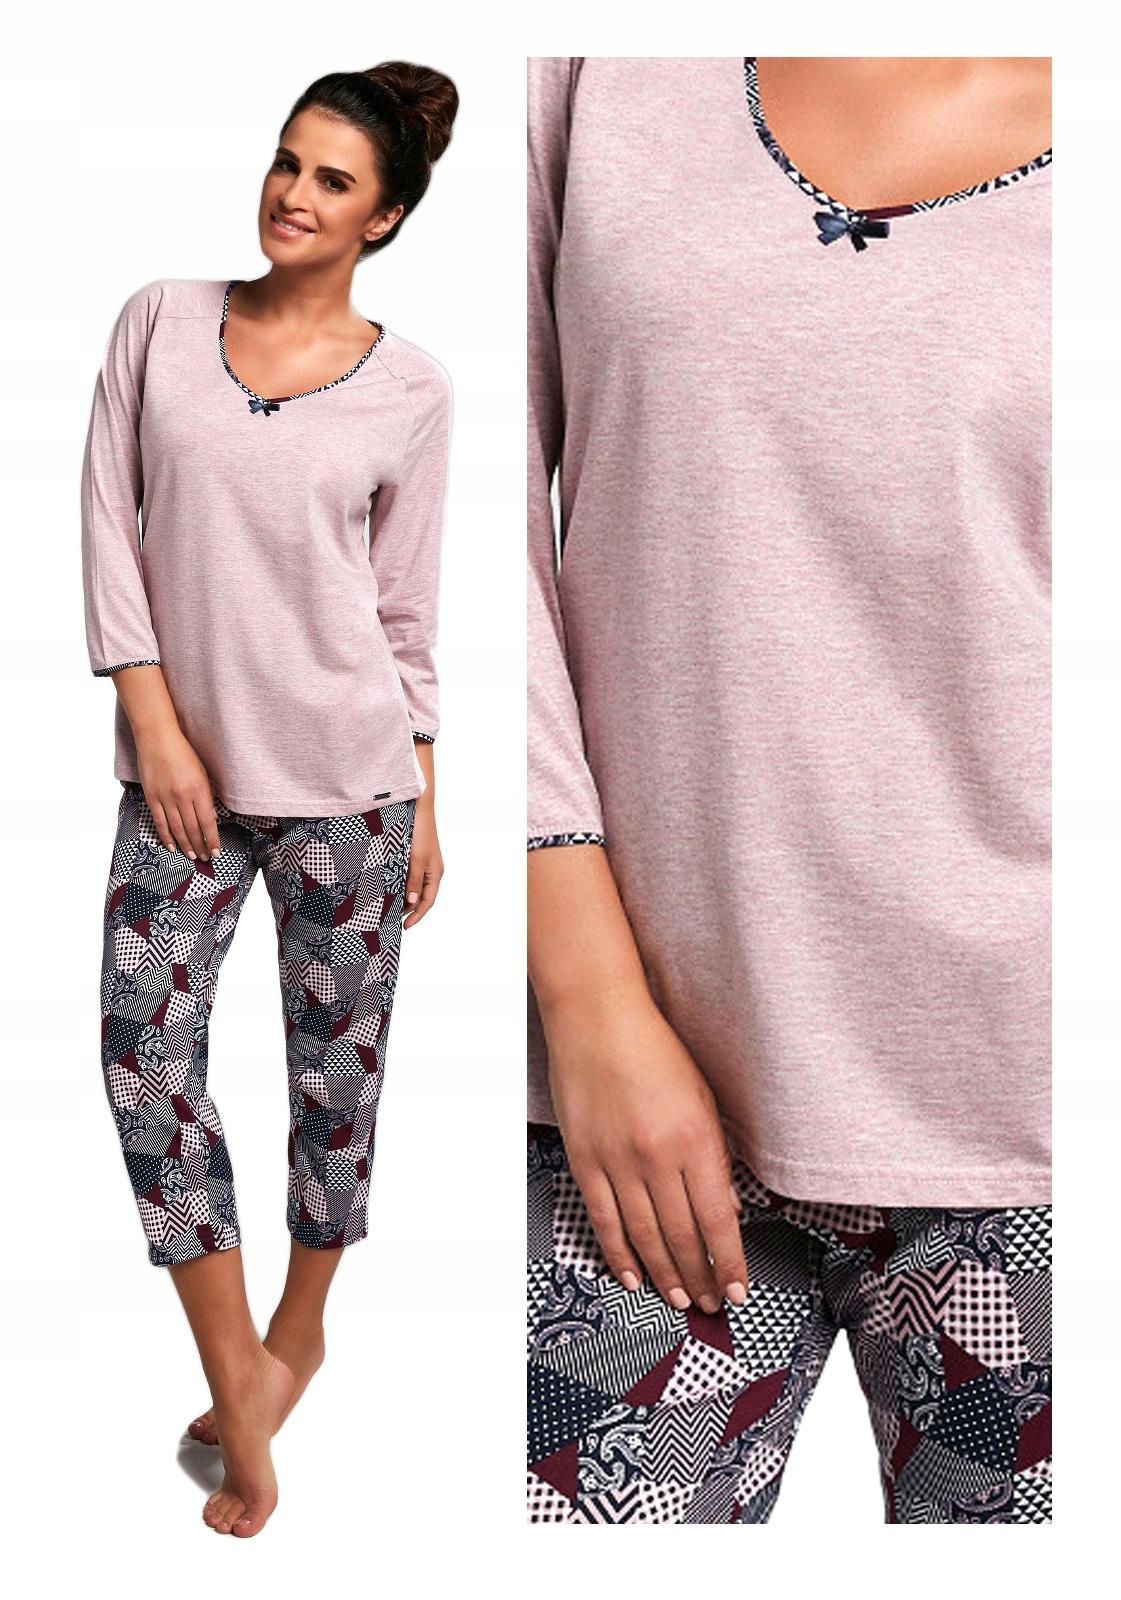 354eb4af49e5cd piżama damska CORNETTE 162/176 SUZIE długa XXL 44 - 7481277241 ...